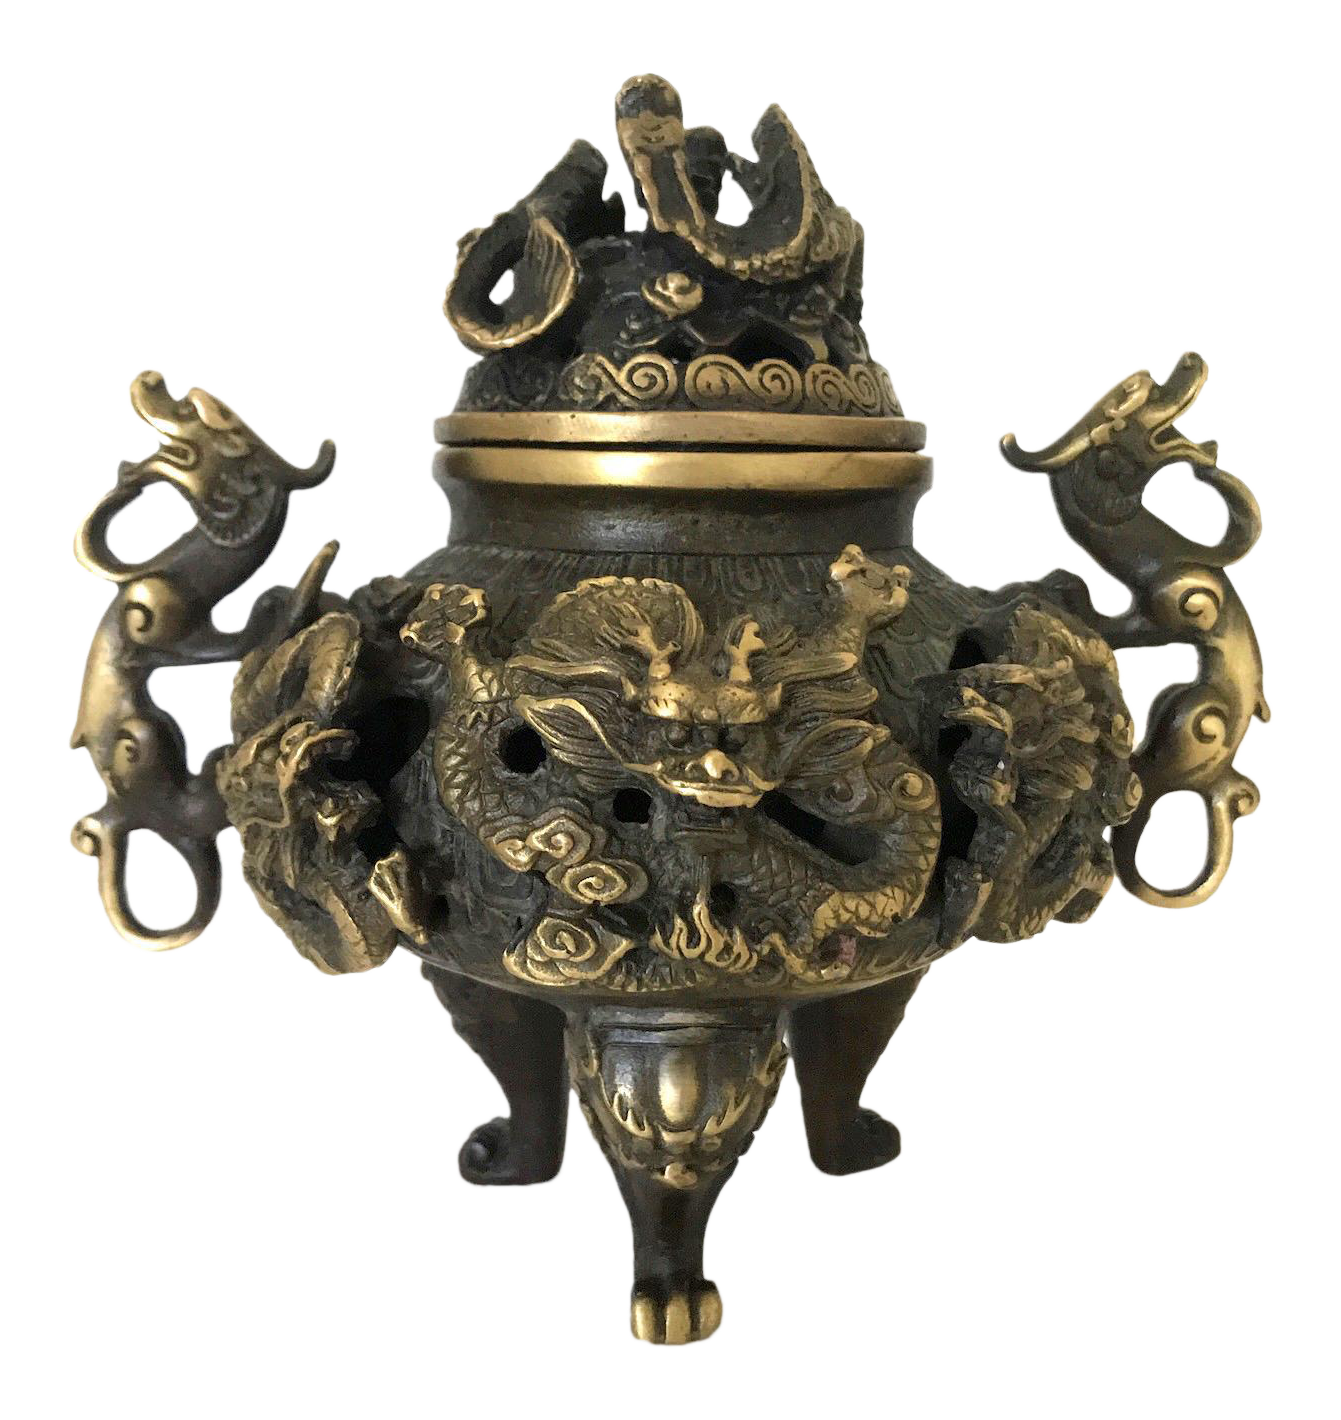 China antique handmade Brass dragon statue Incense Burner